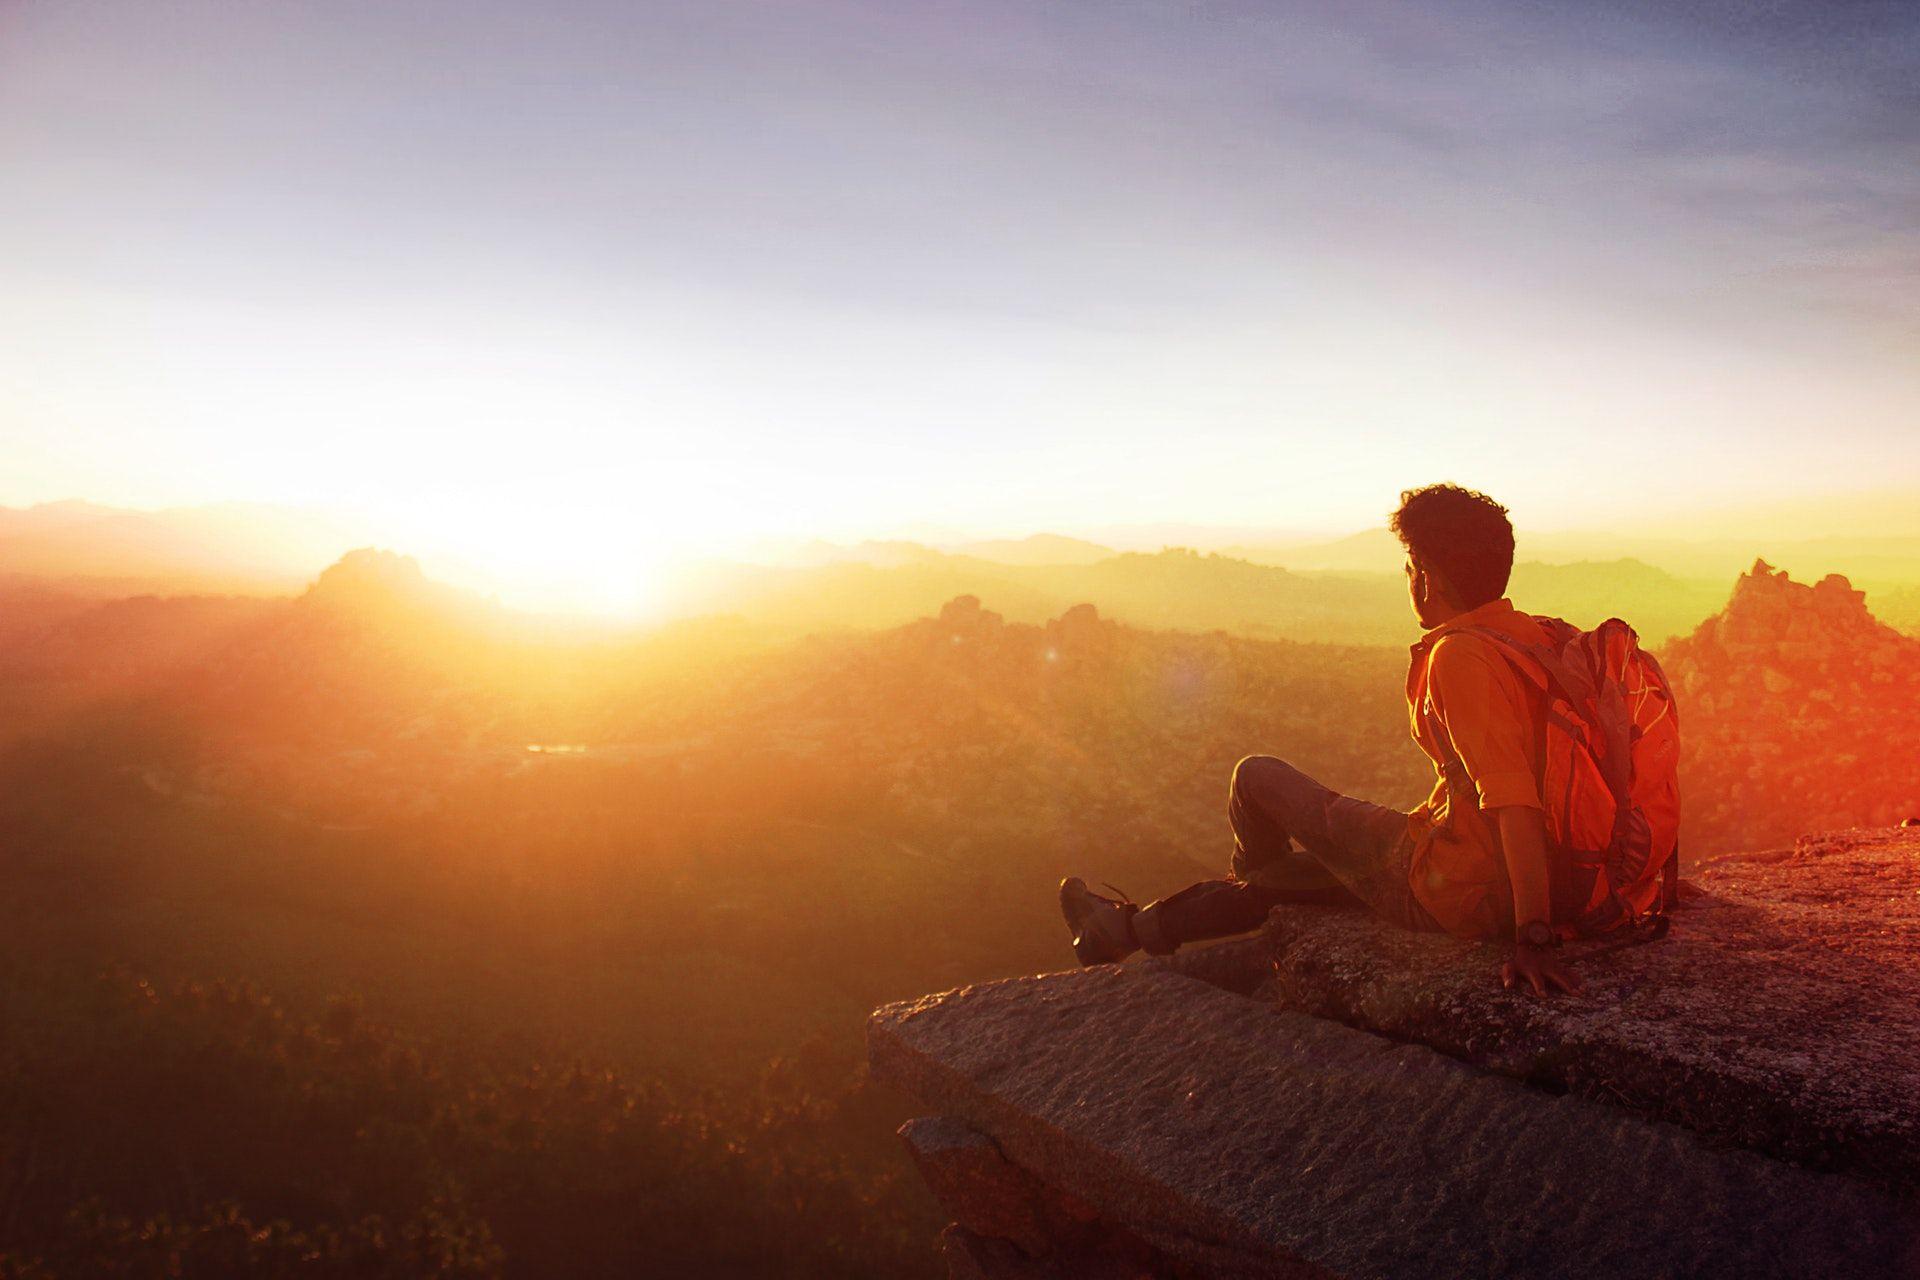 عکس زمینه مرد نشسته در لبه روبرو غروب پس زمینه